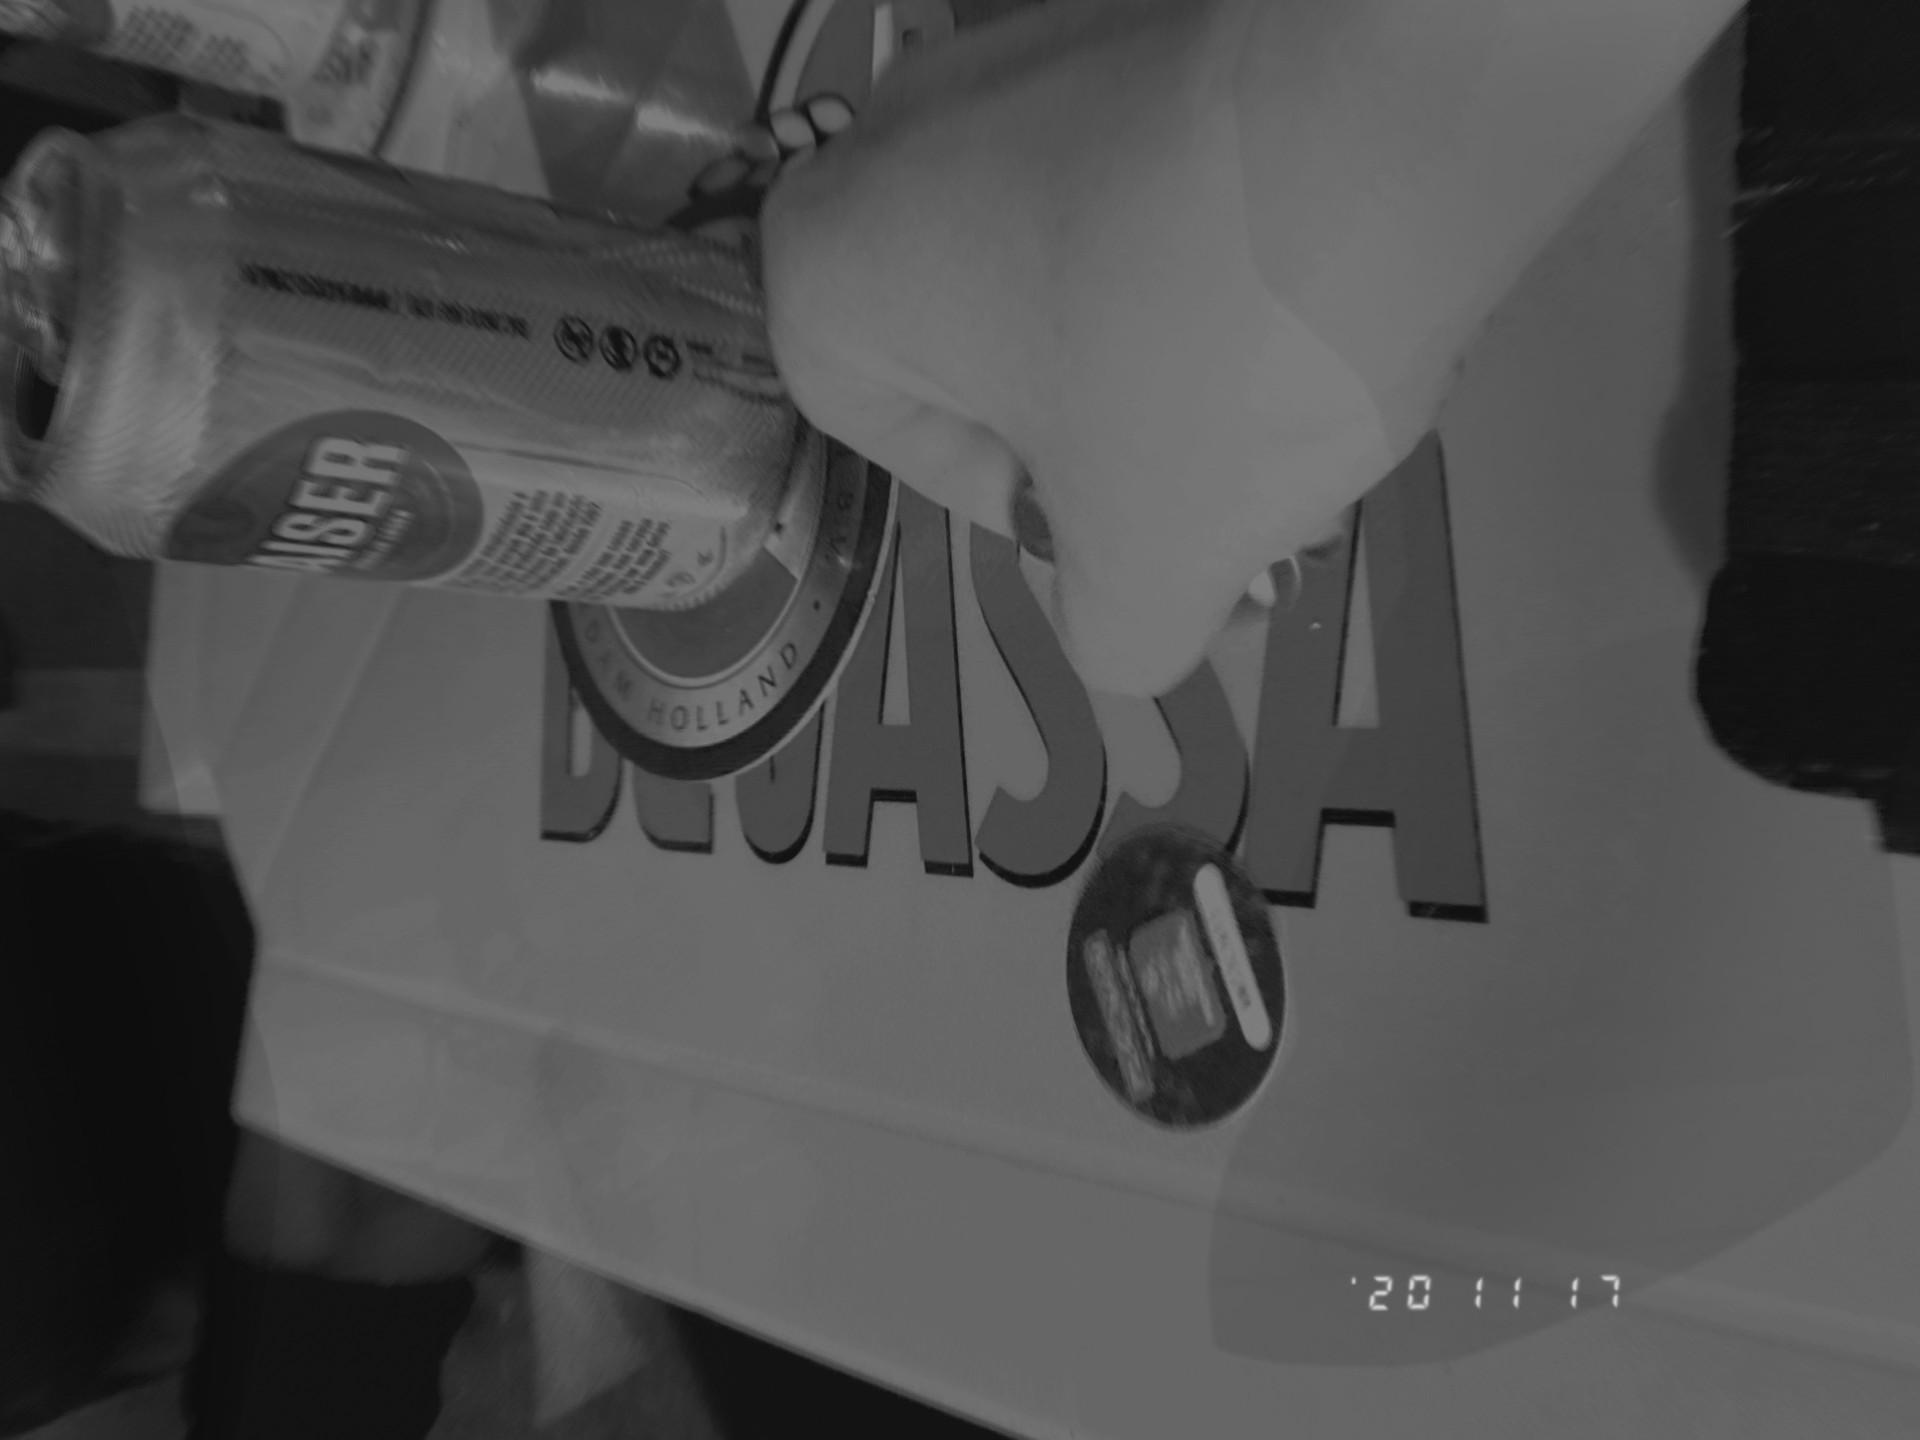 IMG_0723.JPG